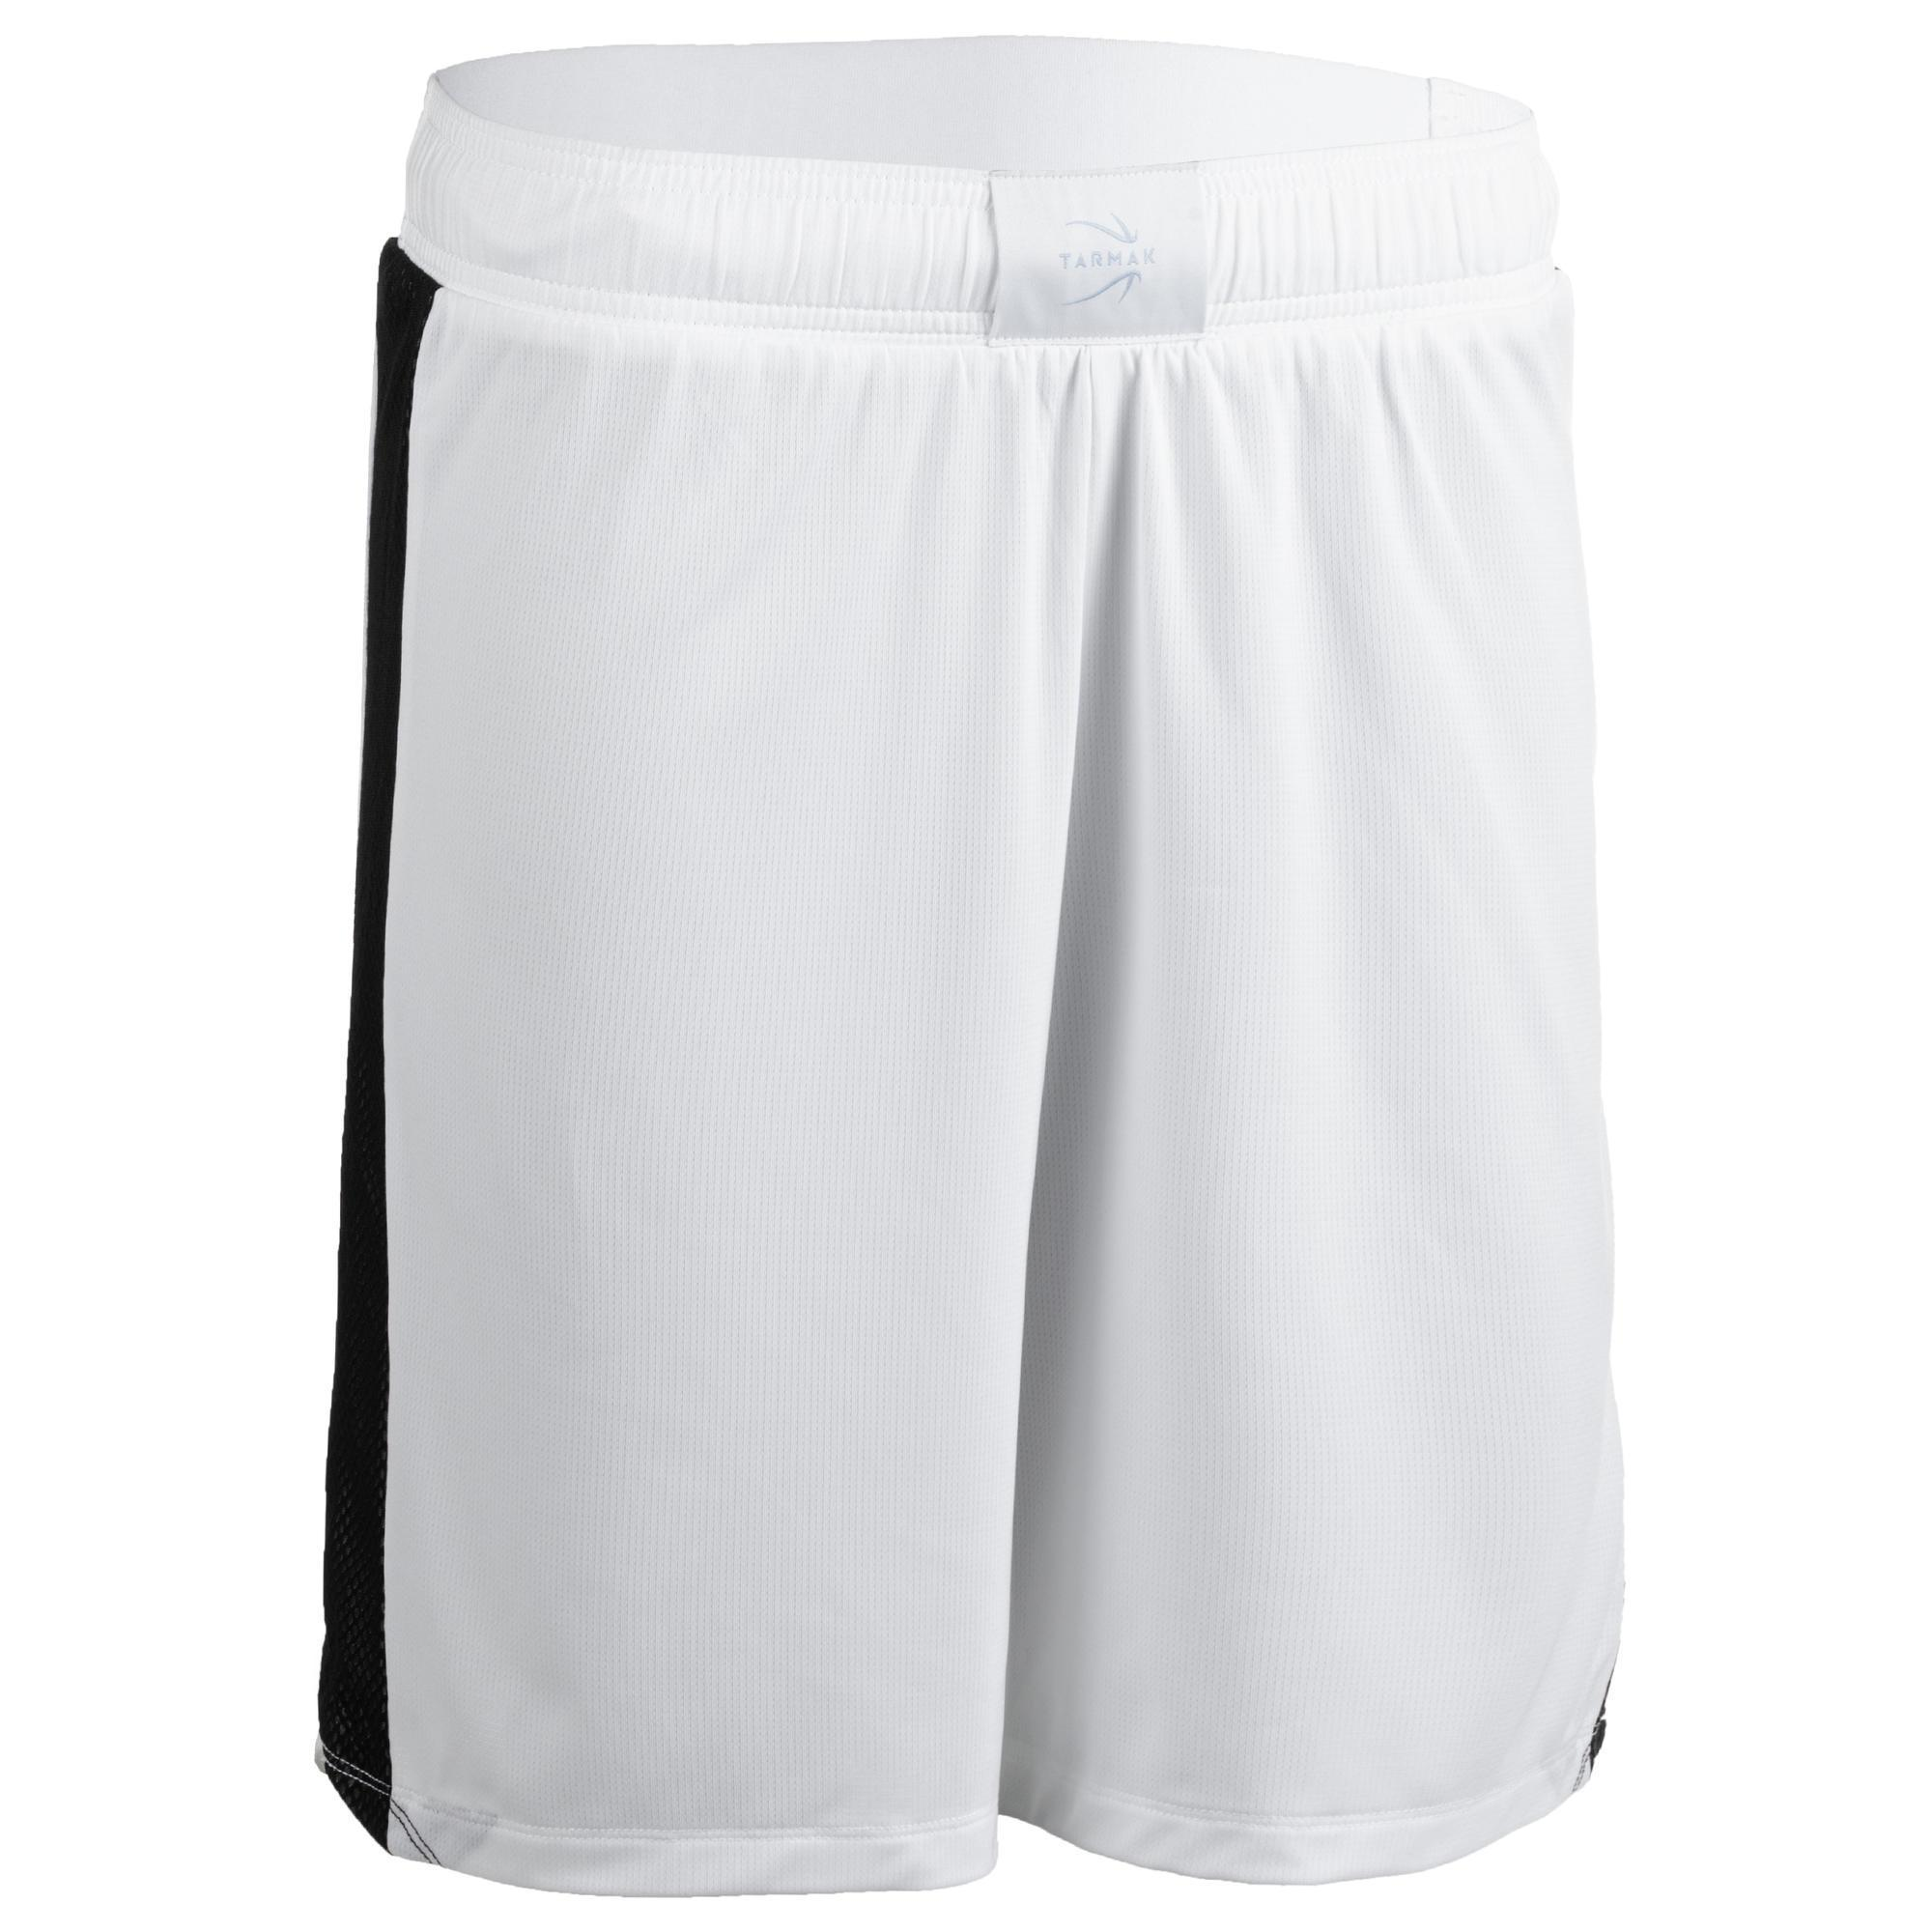 Basketballshorts SH500 Damen | Sportbekleidung | Tarmak